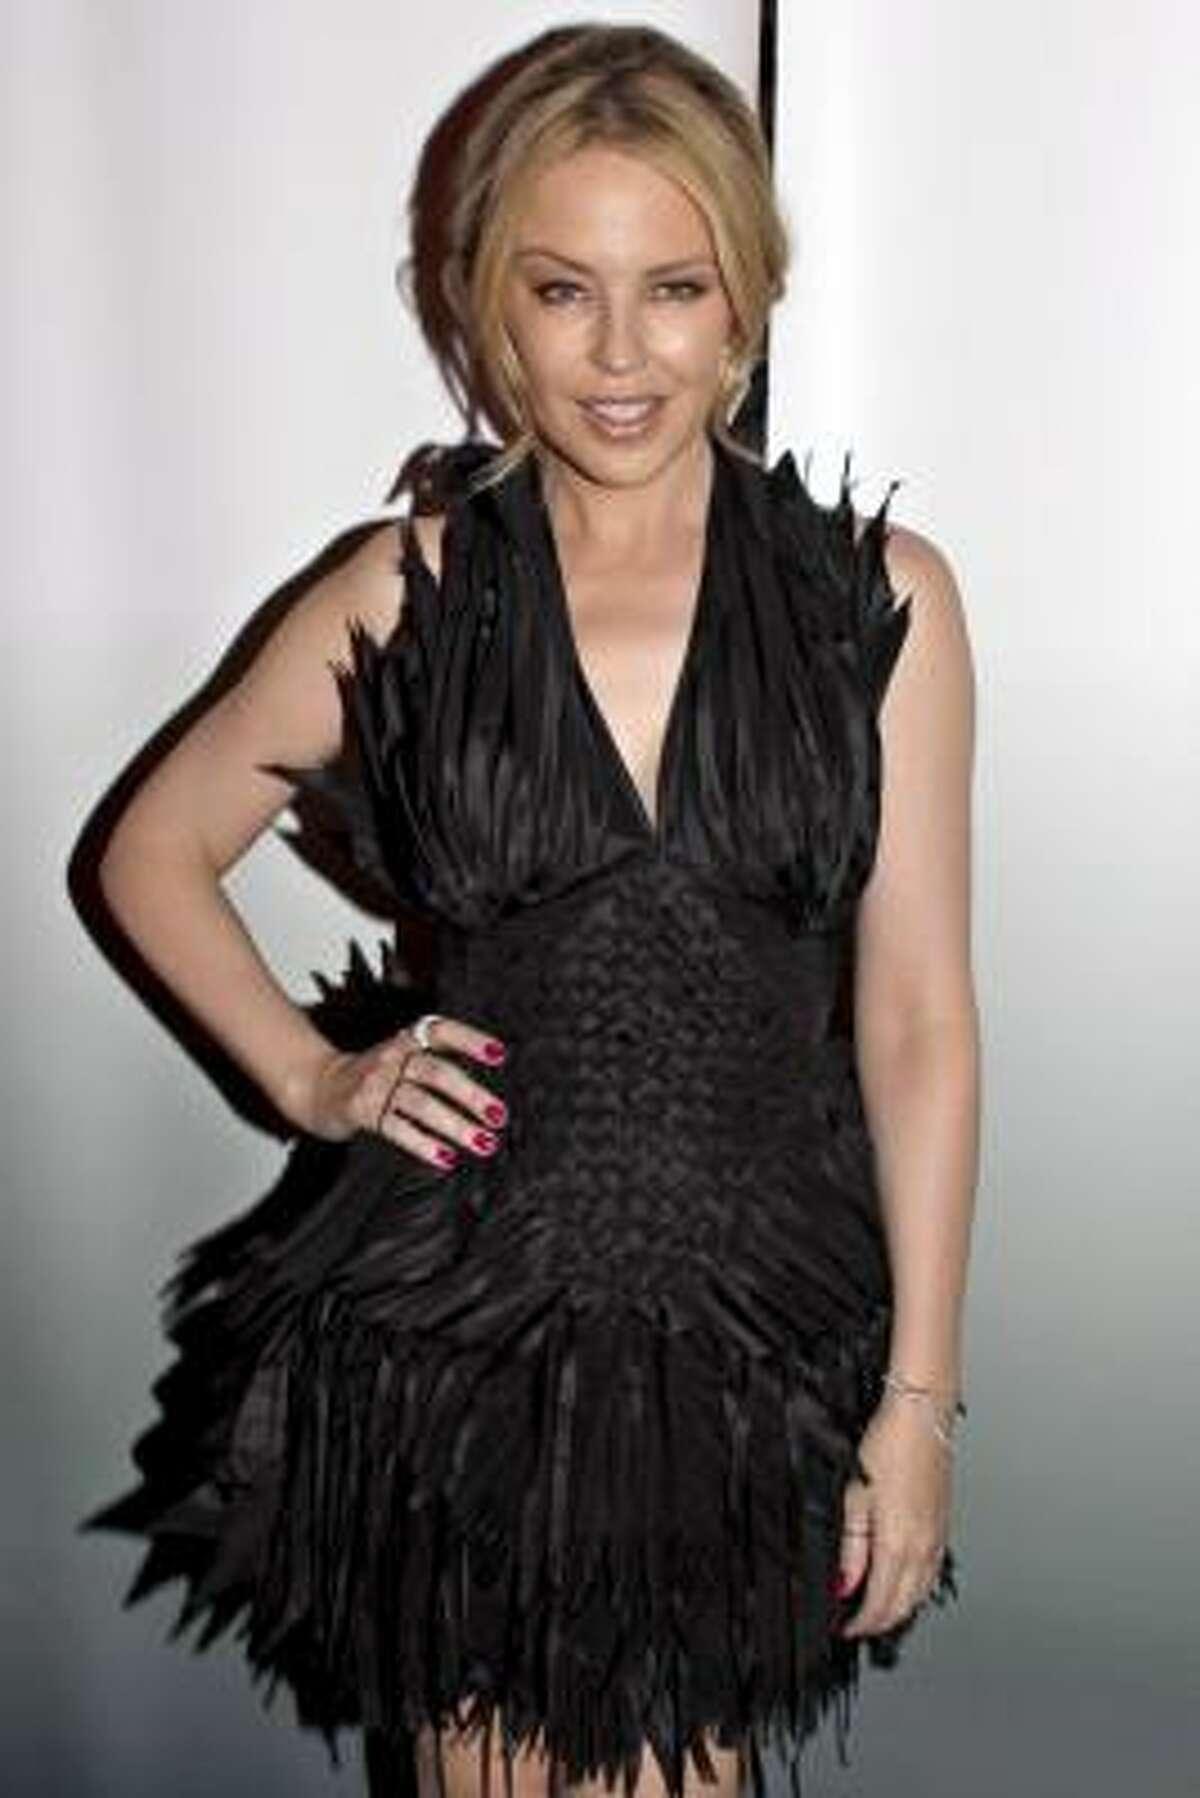 Australian singer Kylie Minogue's latest CD is Aphrodite.